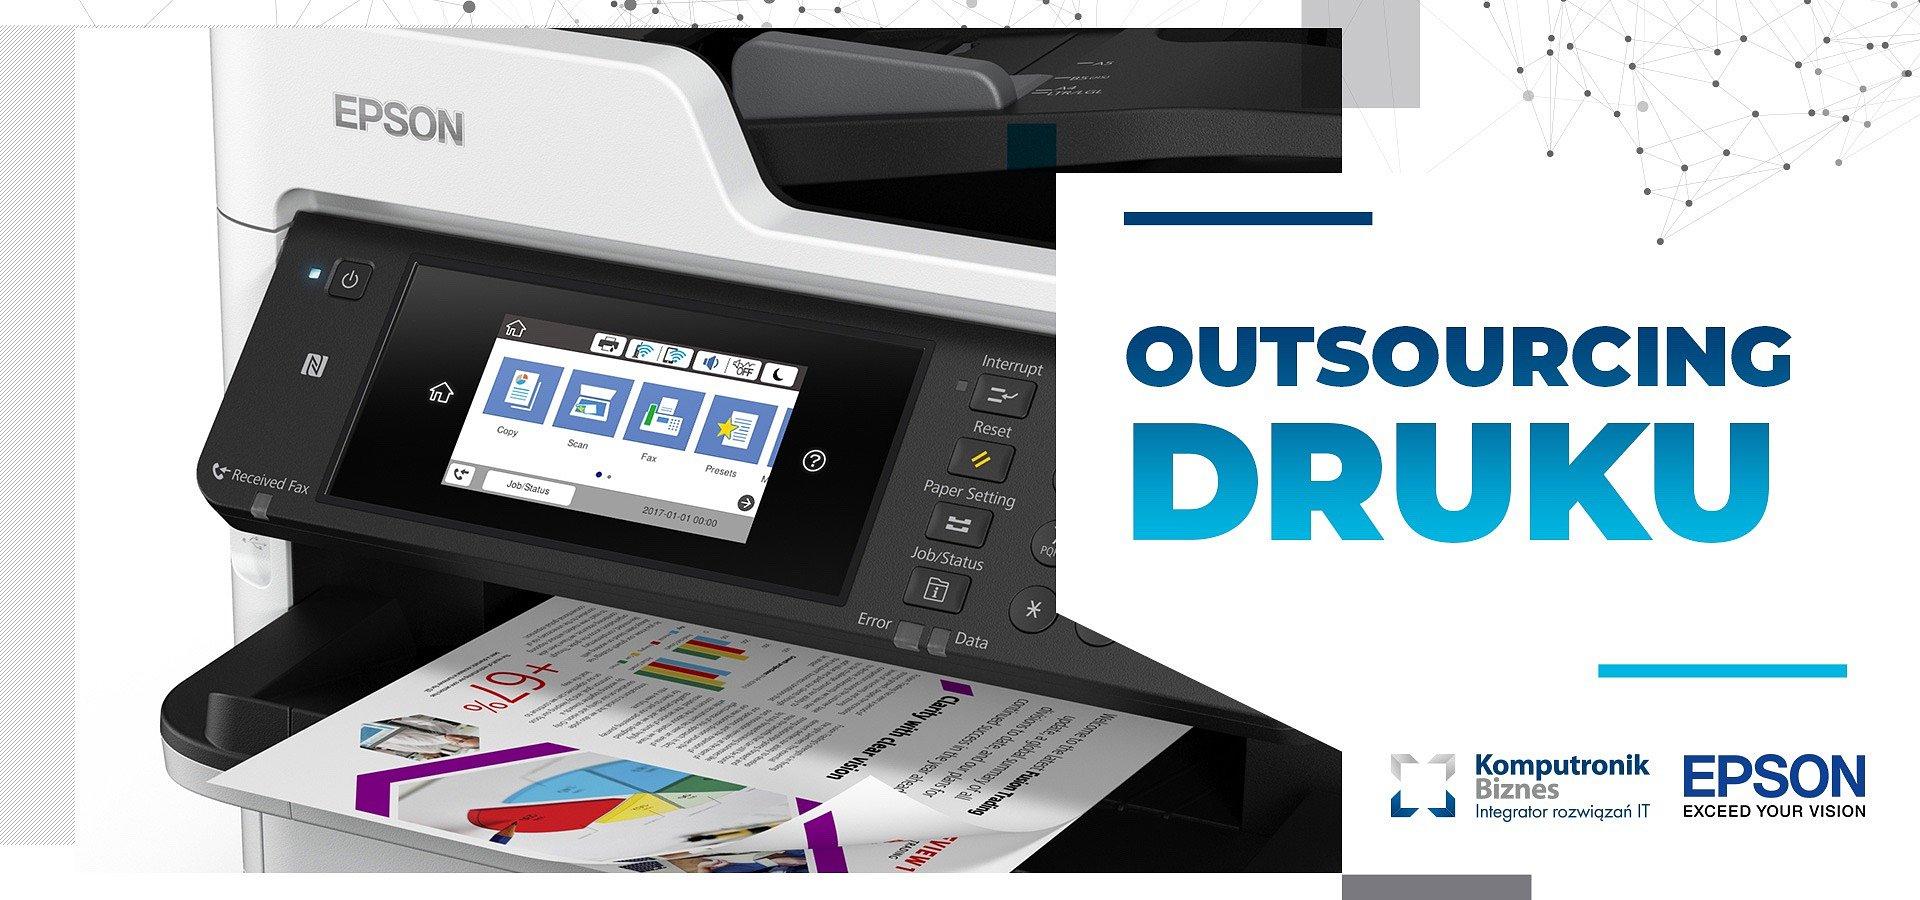 Komputronik Biznes dalej rozwija usługi outsourcingu druku